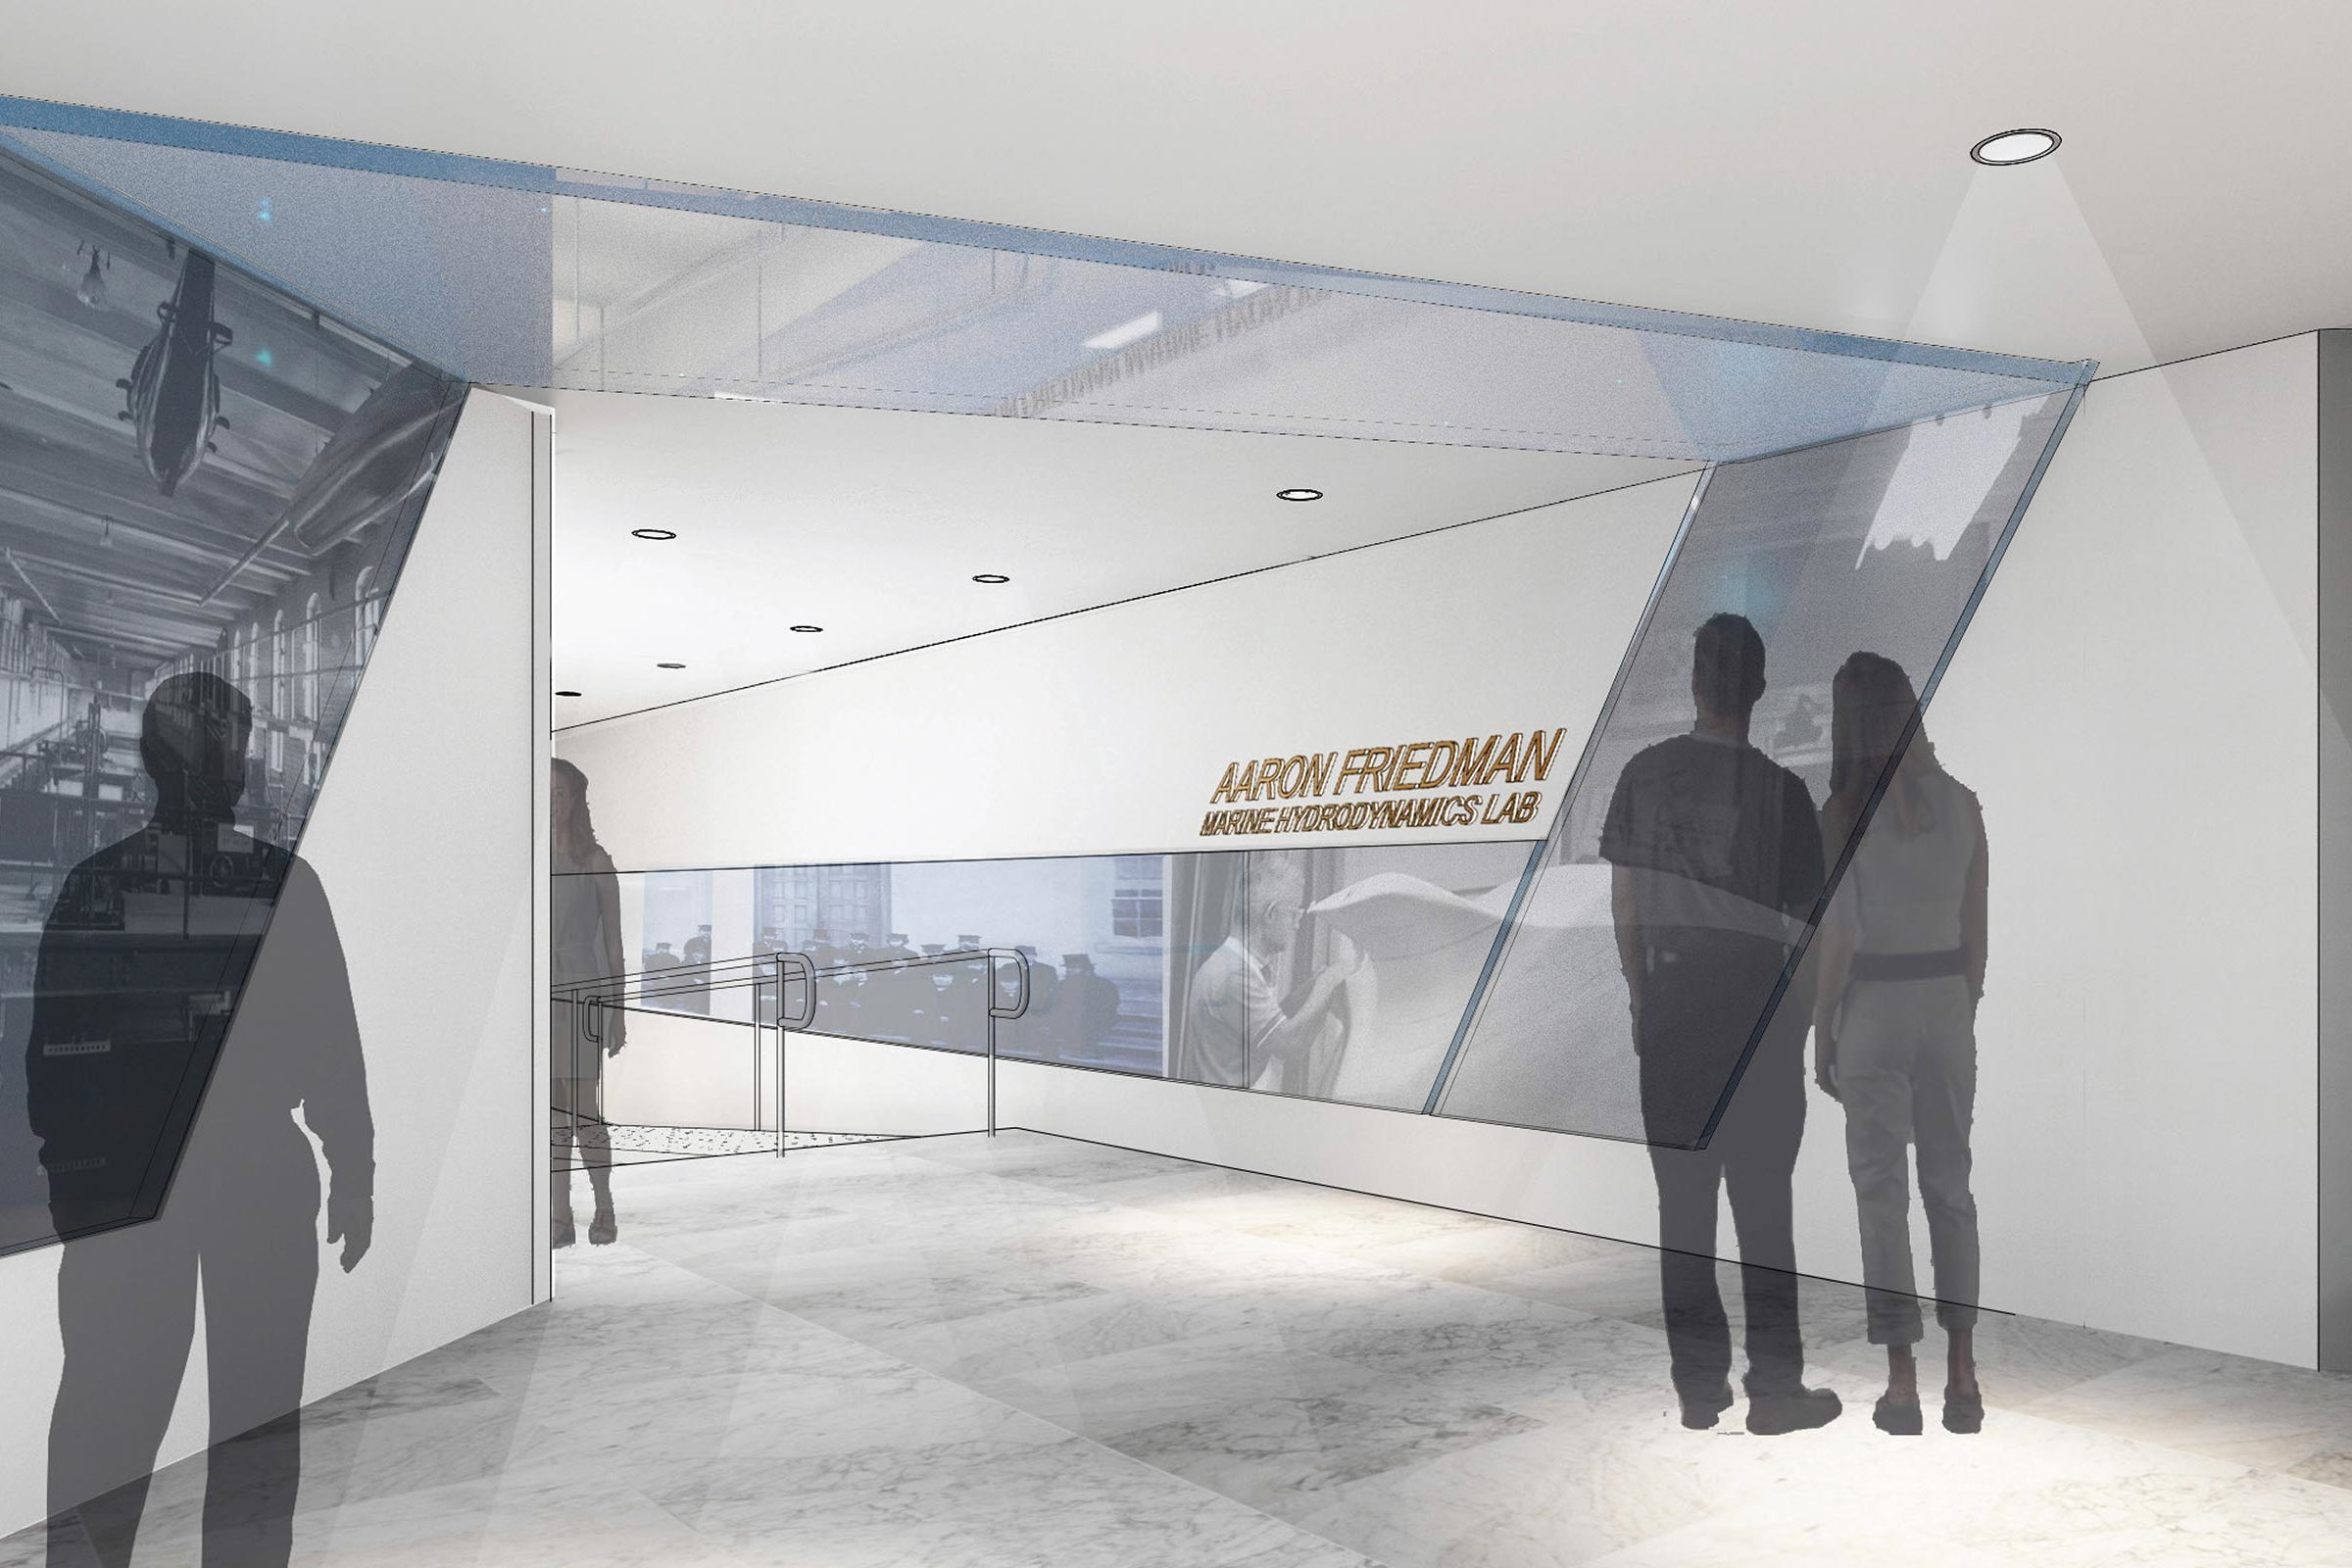 An artist's rendering of the renovated interior vestibule in the Friedman Marine Hydrodynamics Lab.